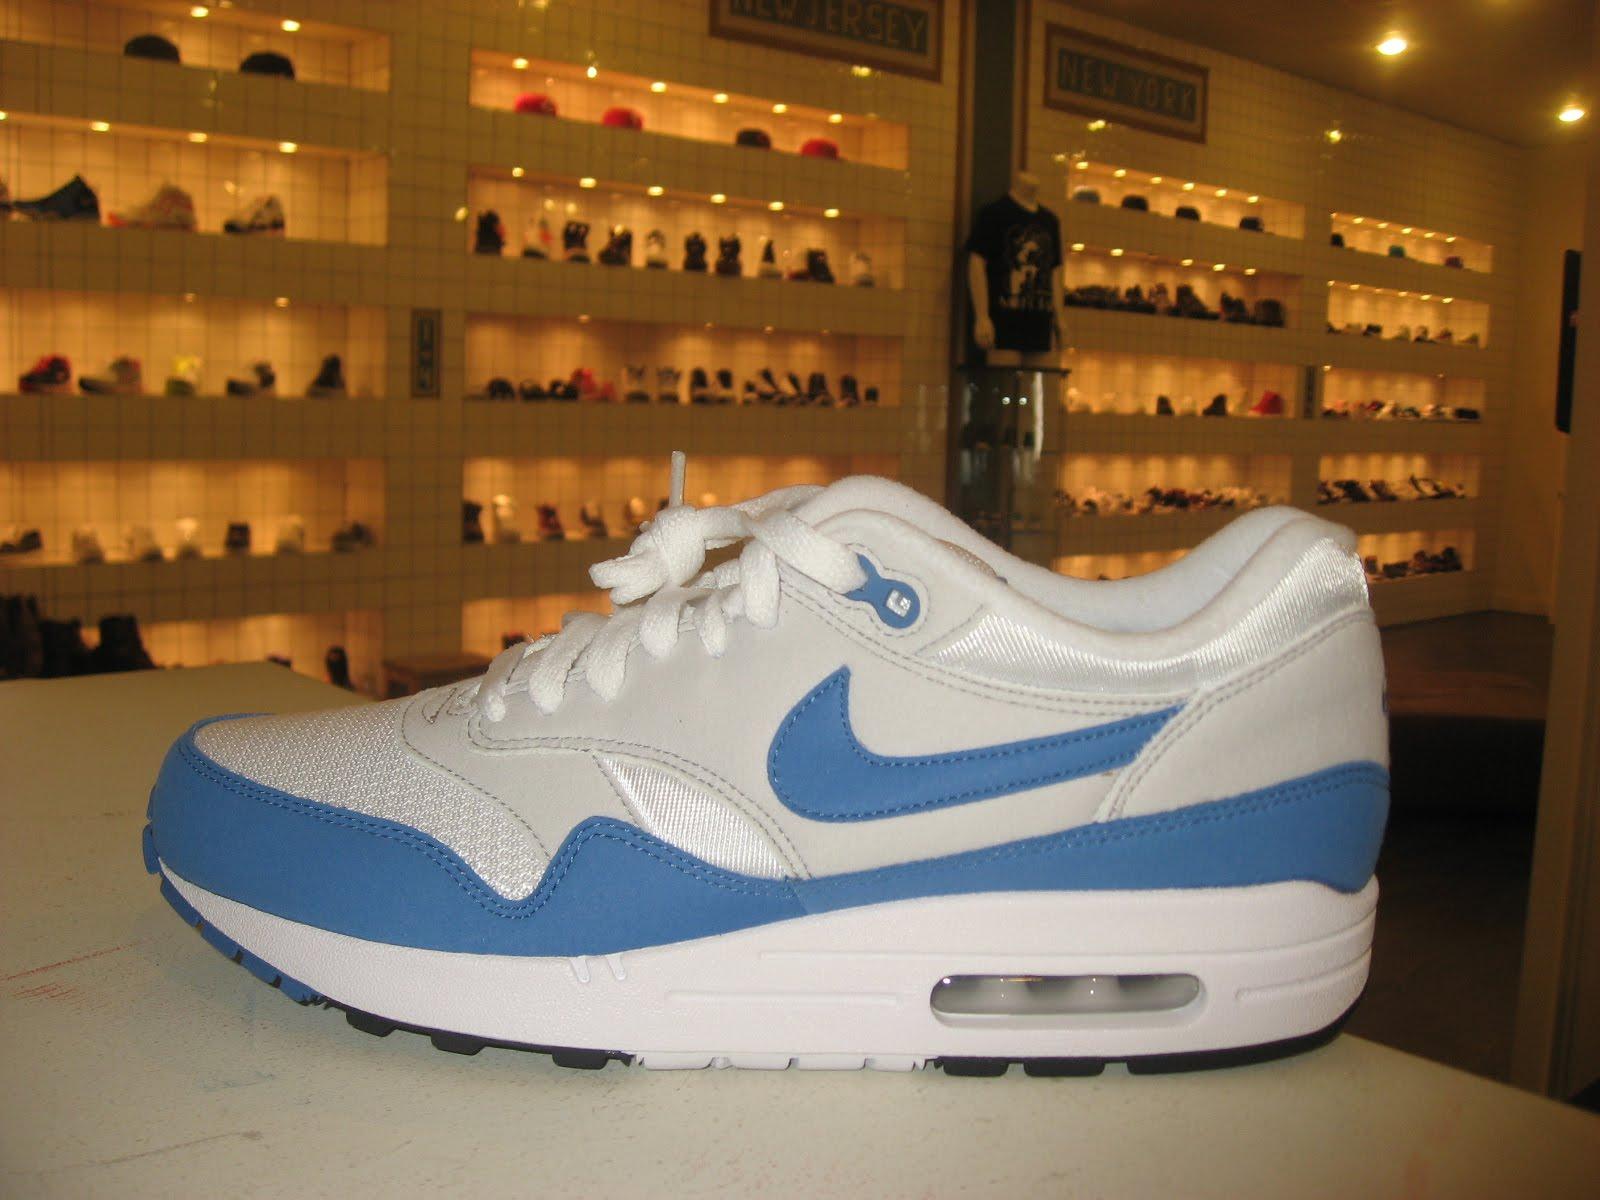 f0726241c2 Nike Air Max 1 QS in White/Varsity Royal-Neutral Grey | The Sixth Boro